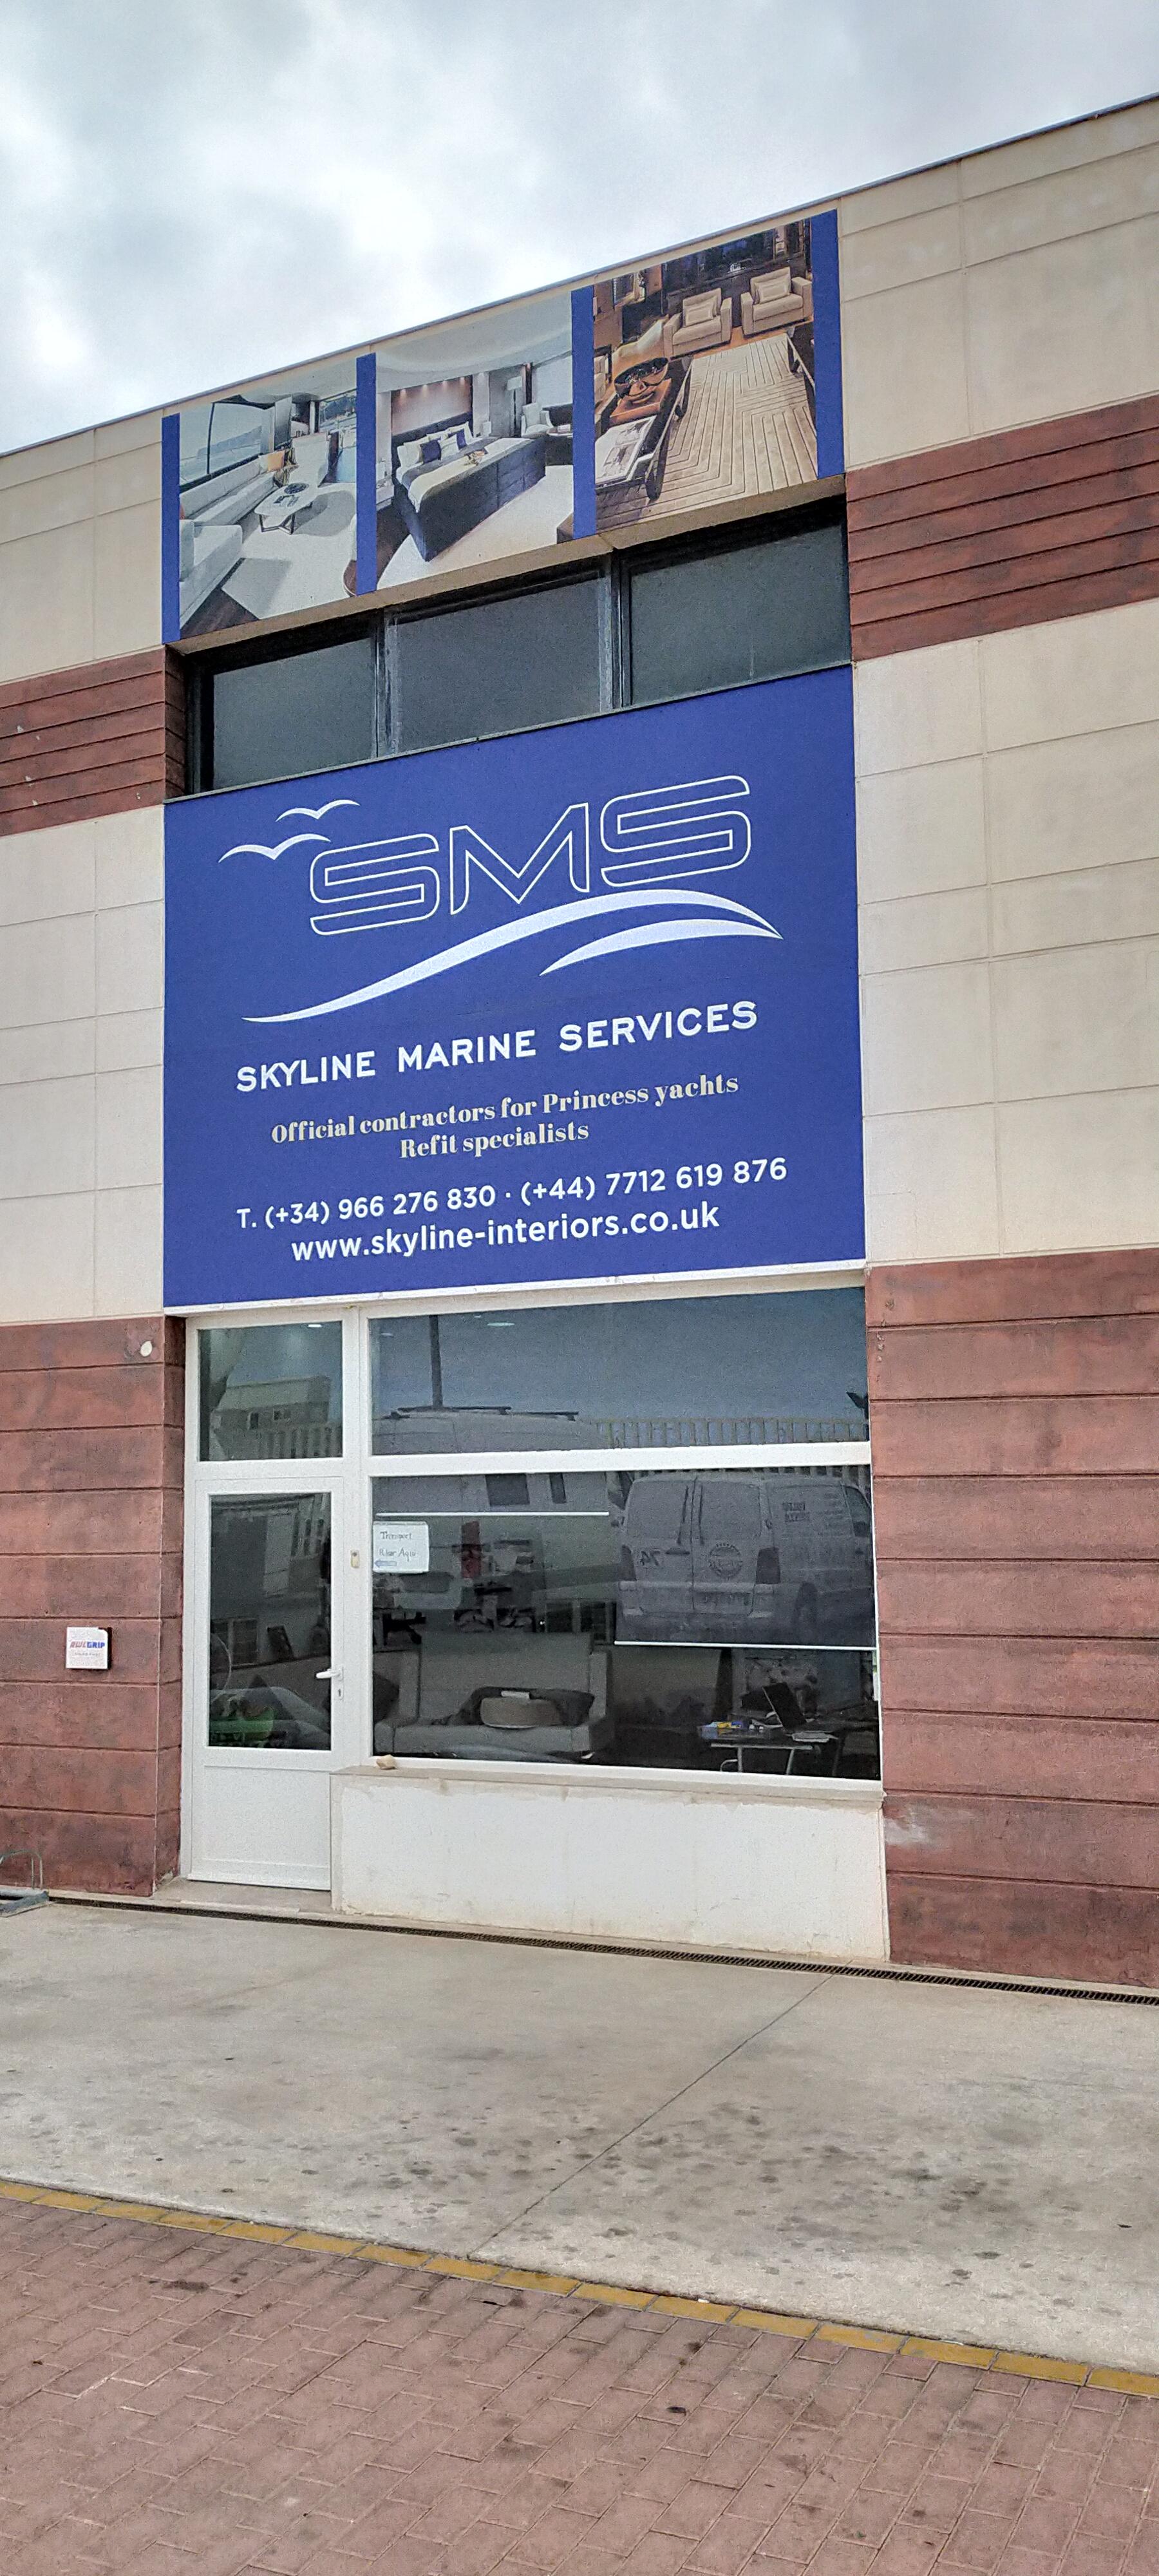 Skyline Marine Services